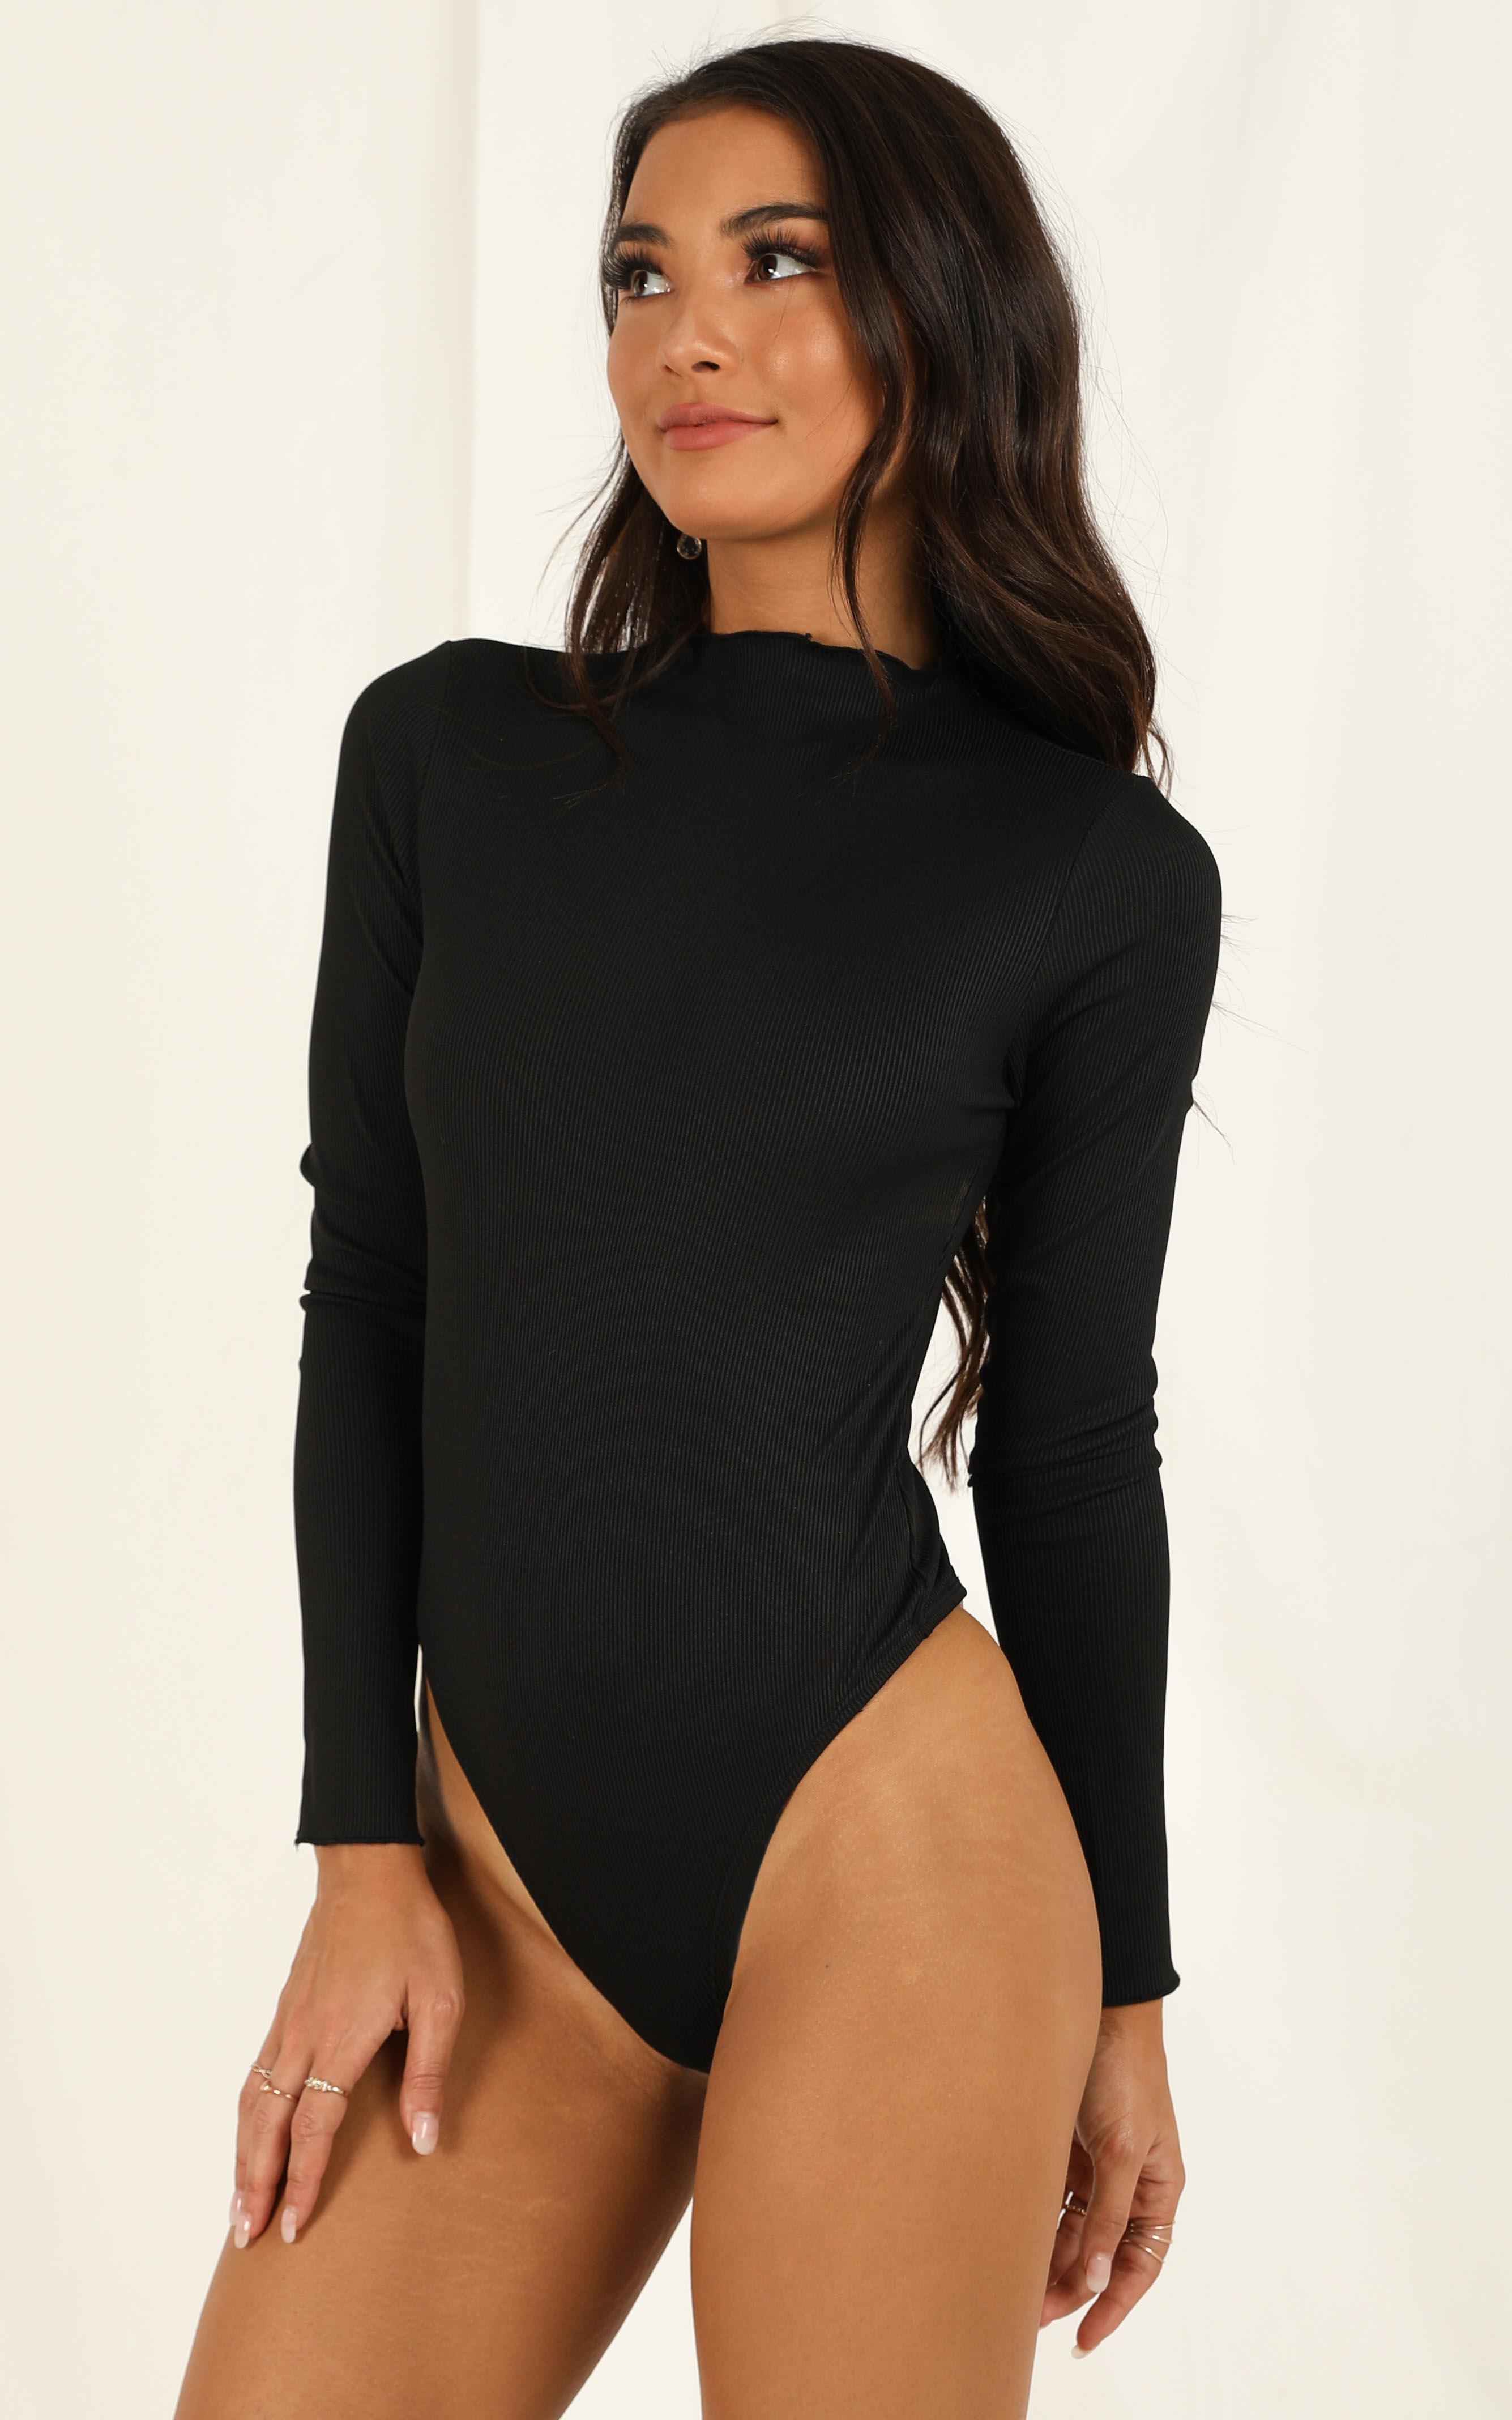 Natural Attraction Bodysuit in black - 14 (XL), Black, hi-res image number null